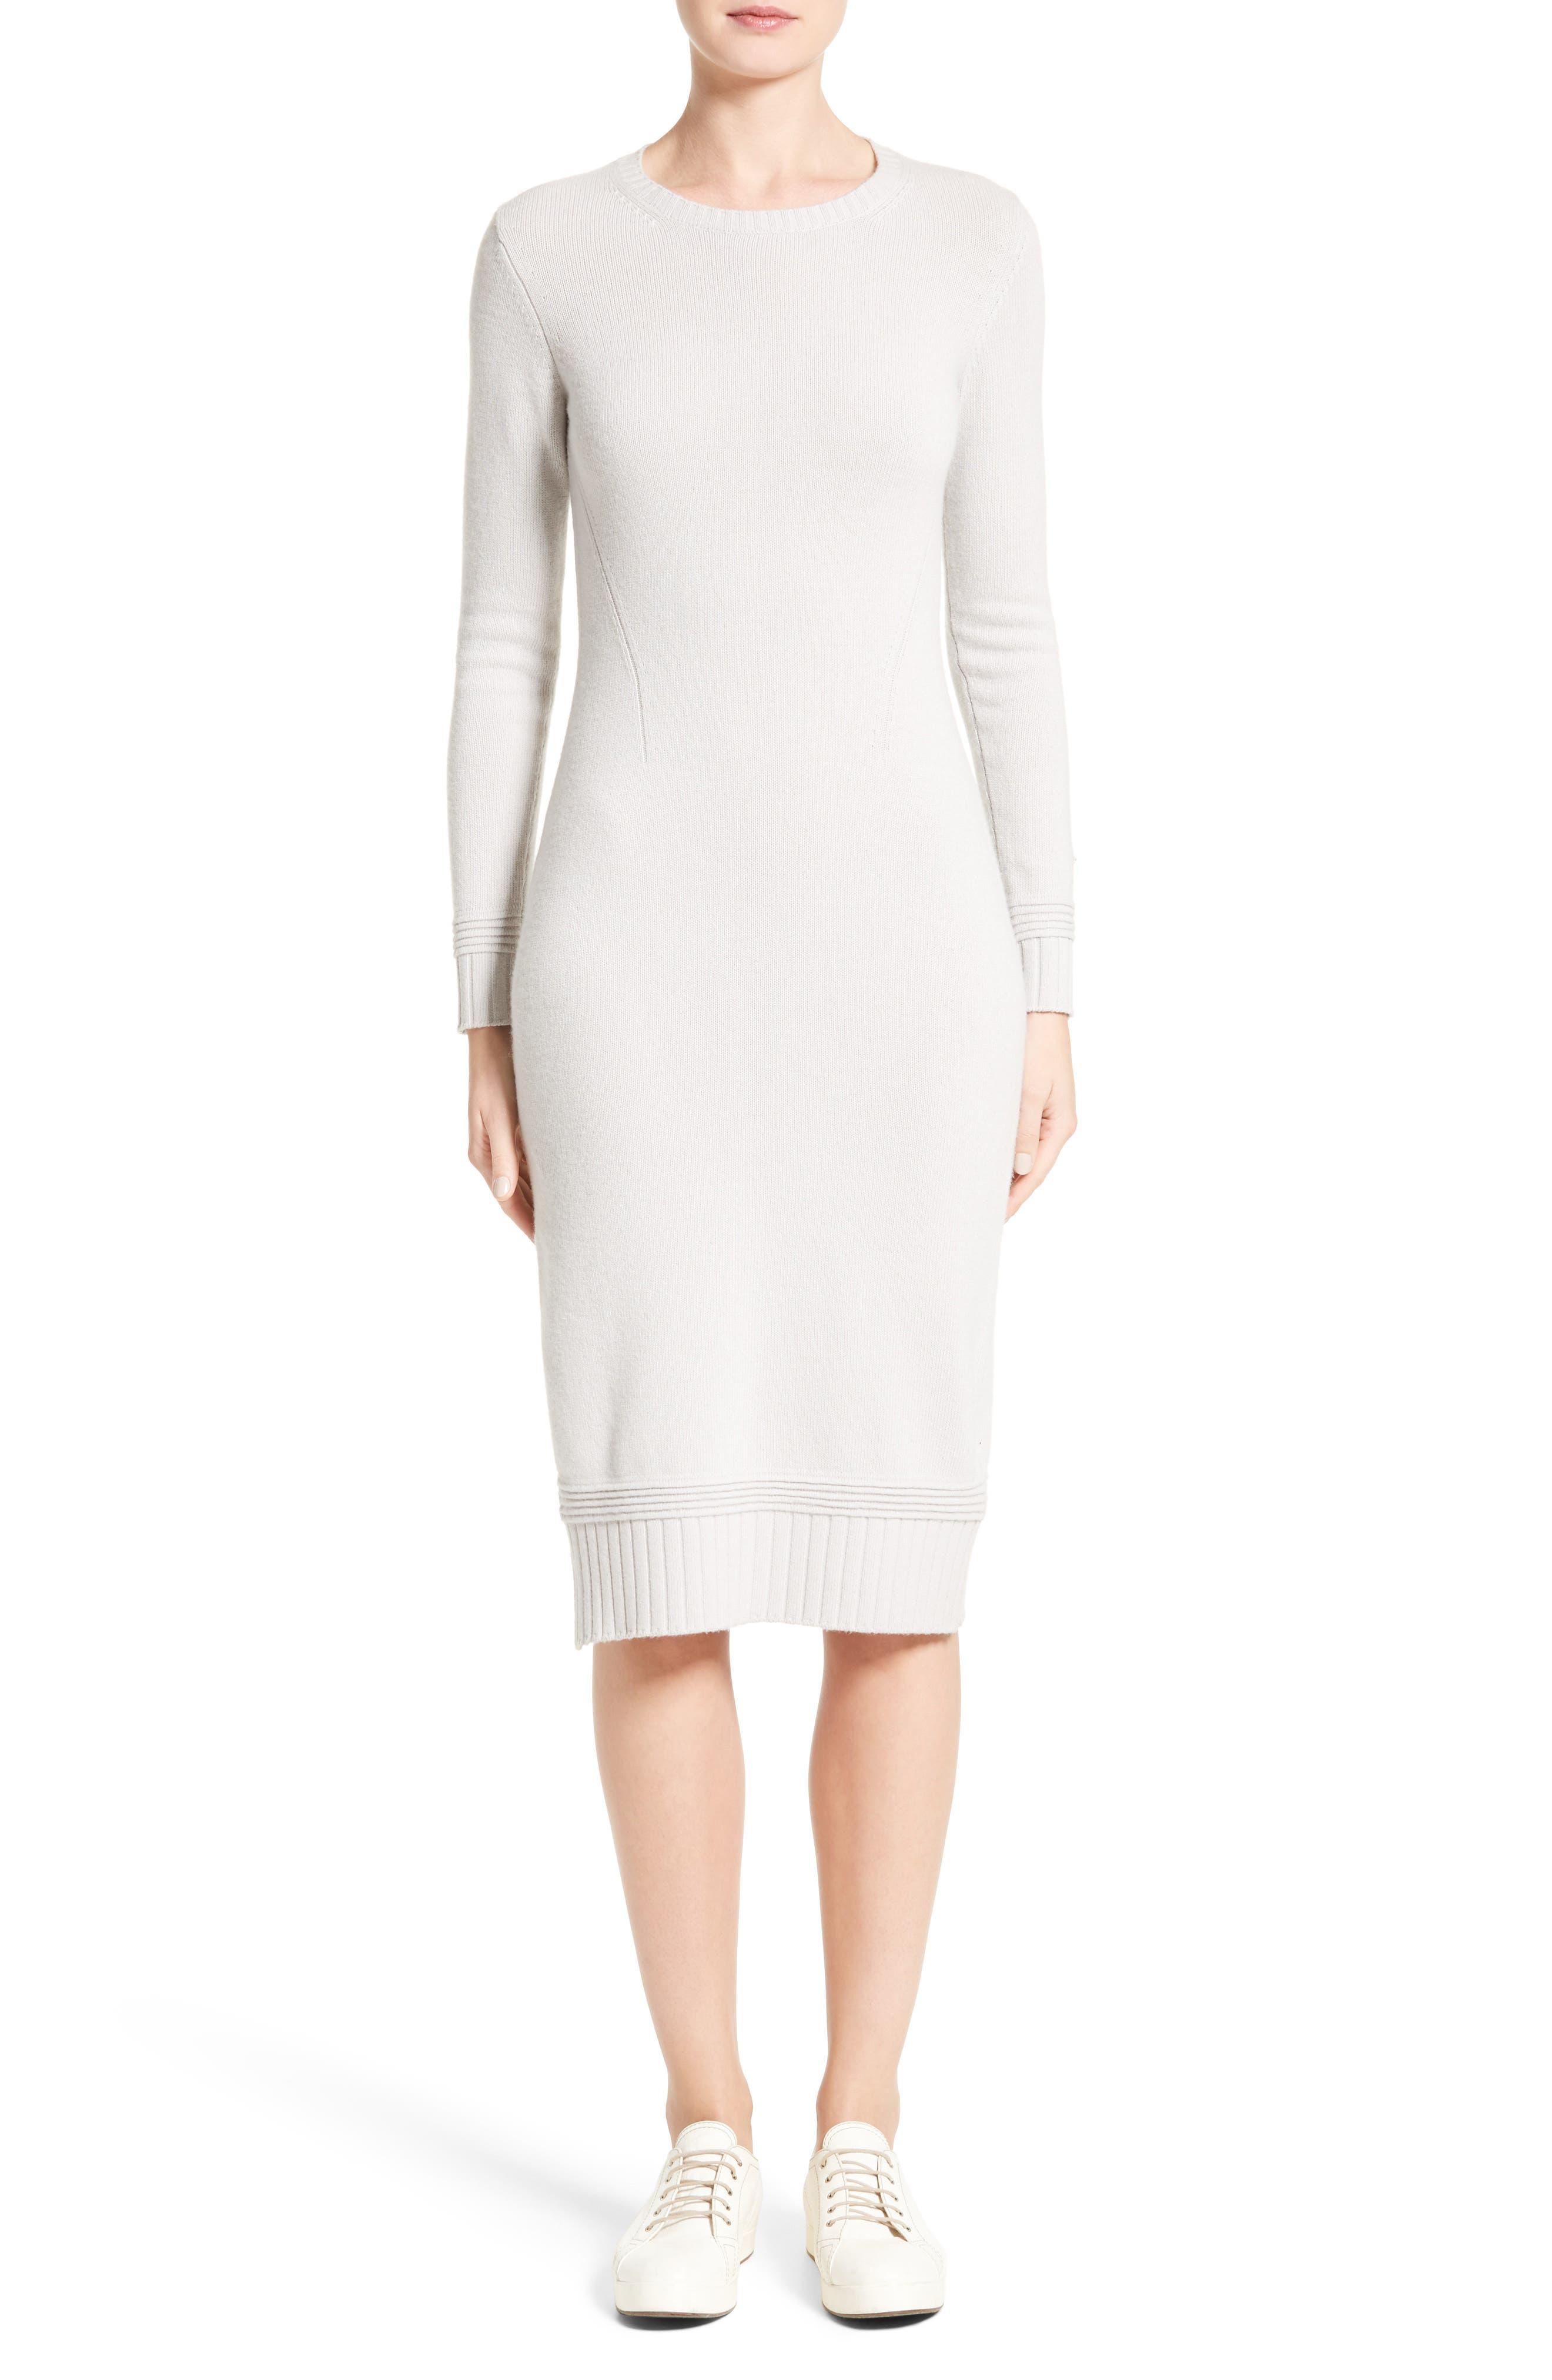 Armani Jeans Knit Sweater Dress,                             Main thumbnail 1, color,                             Light Grey